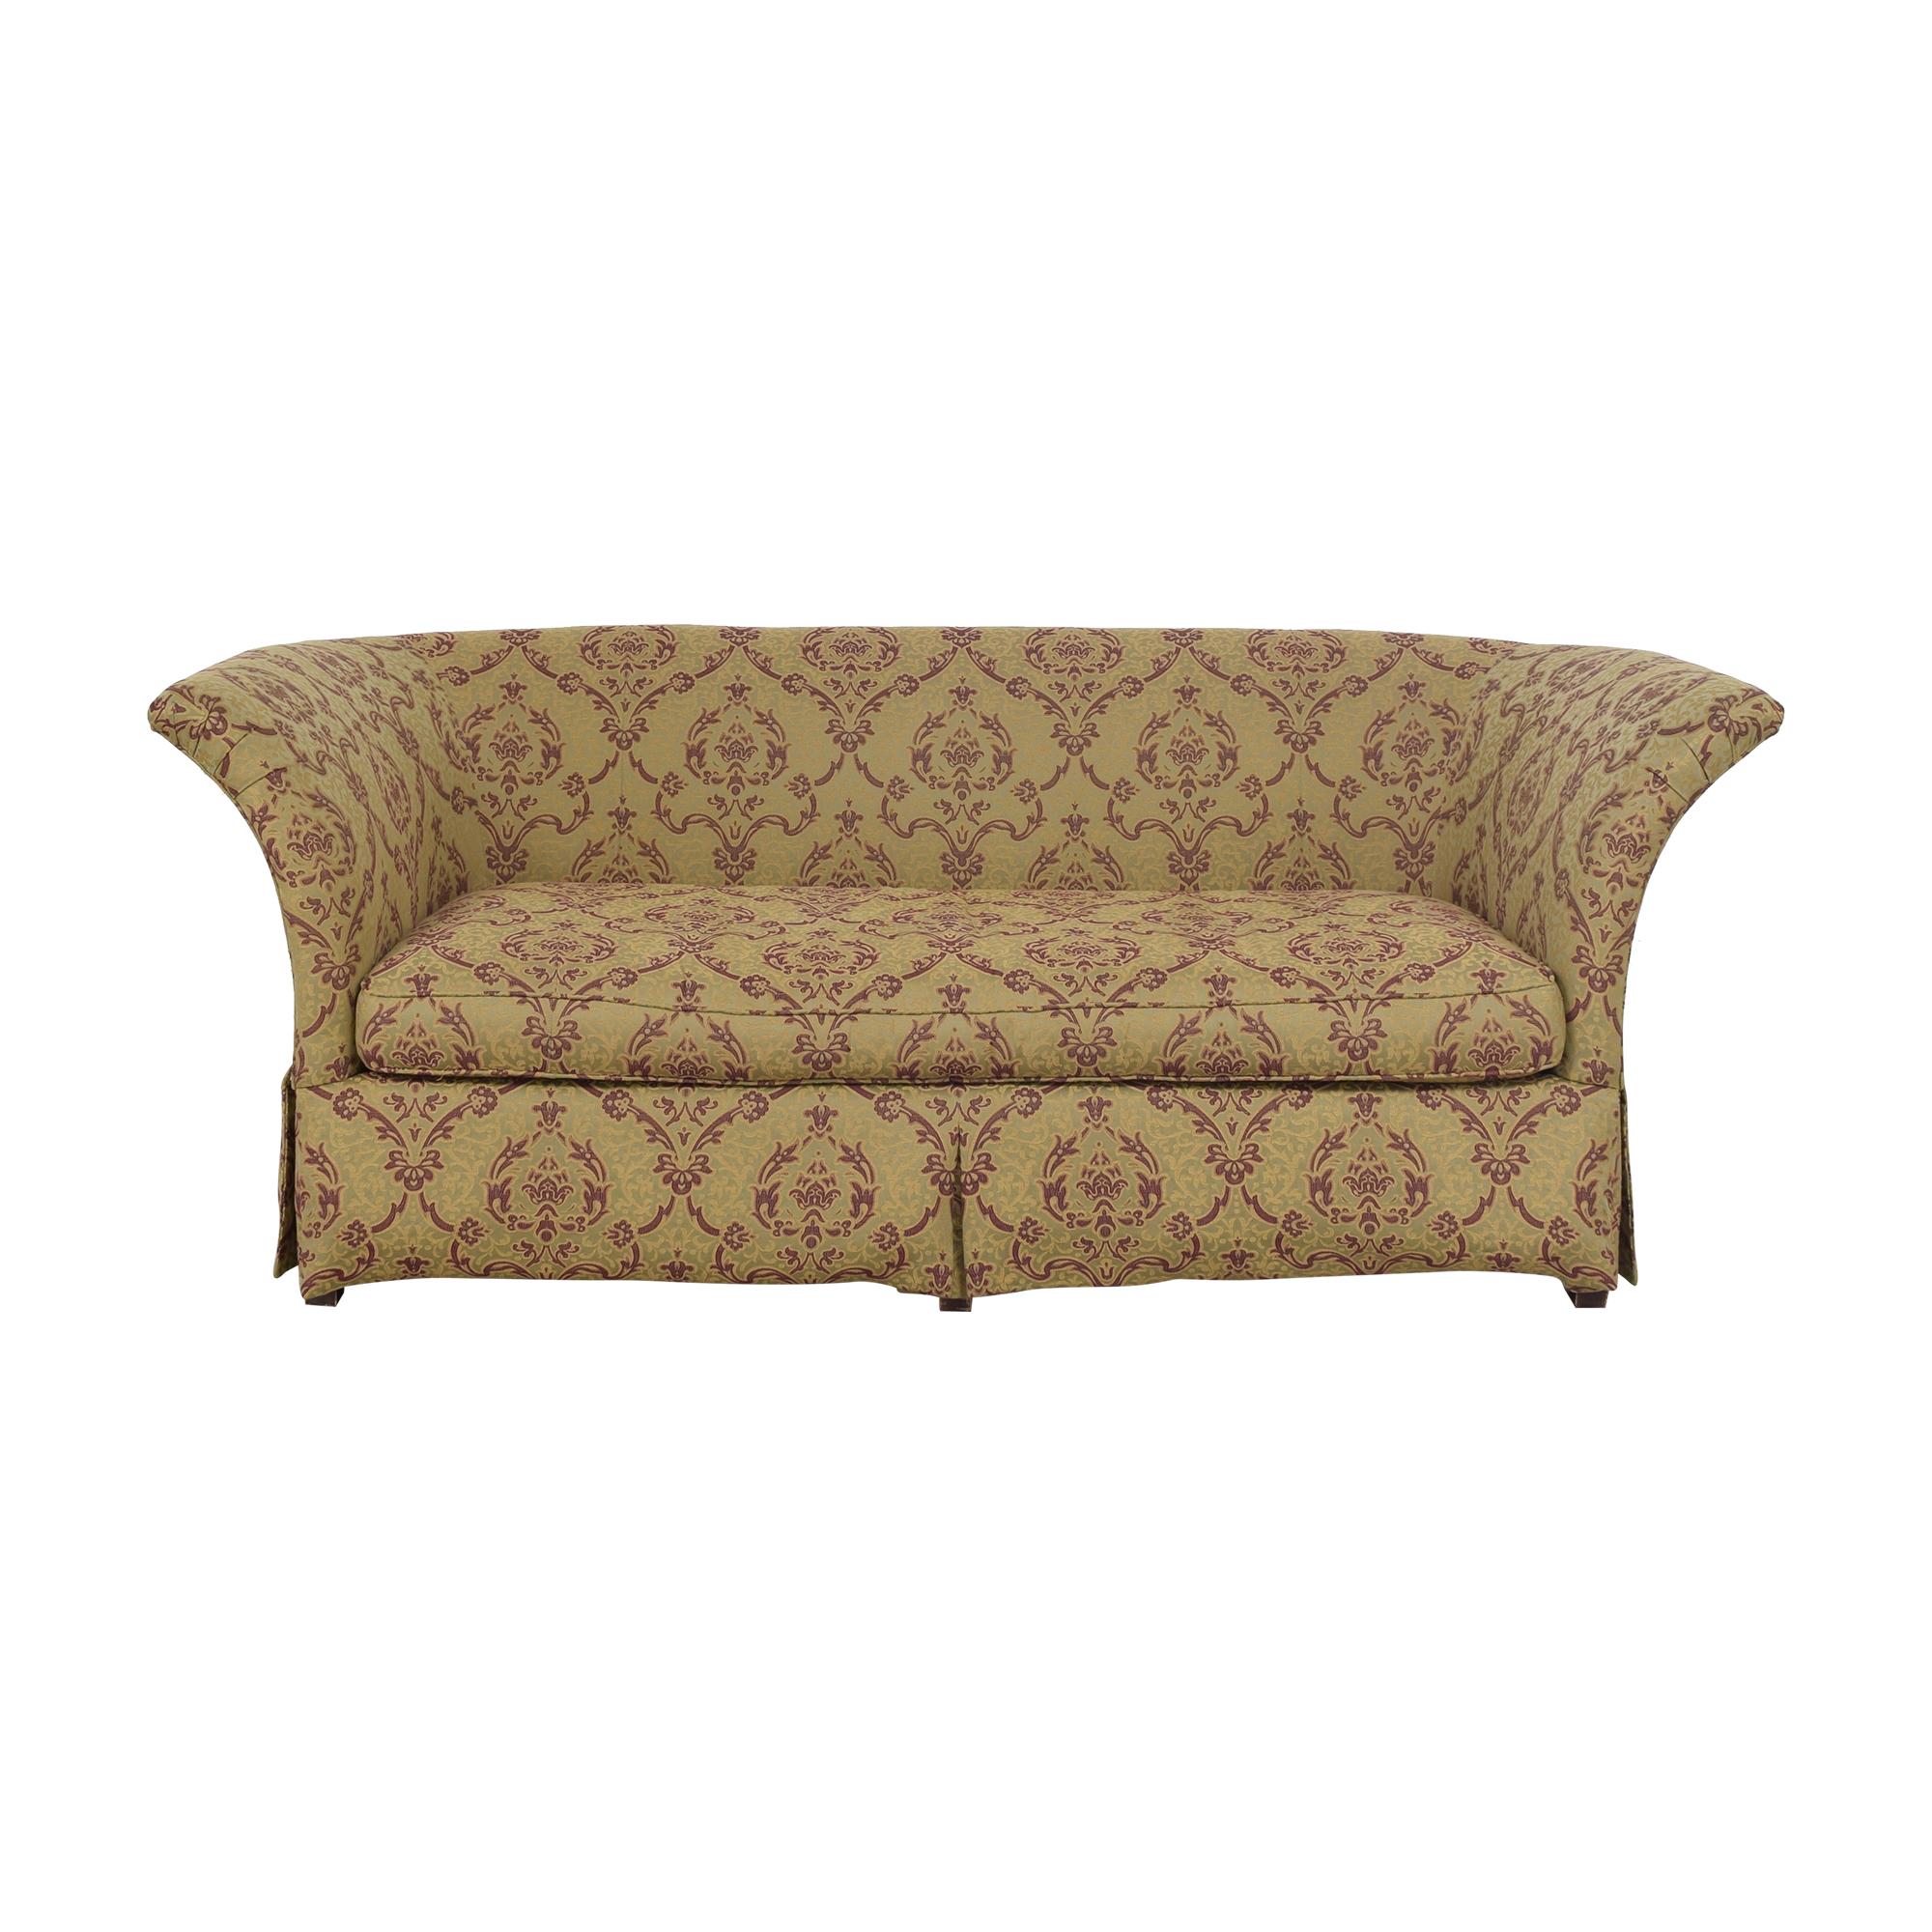 Drexel Heritage Drexel Heritage Flared Arm Sofa